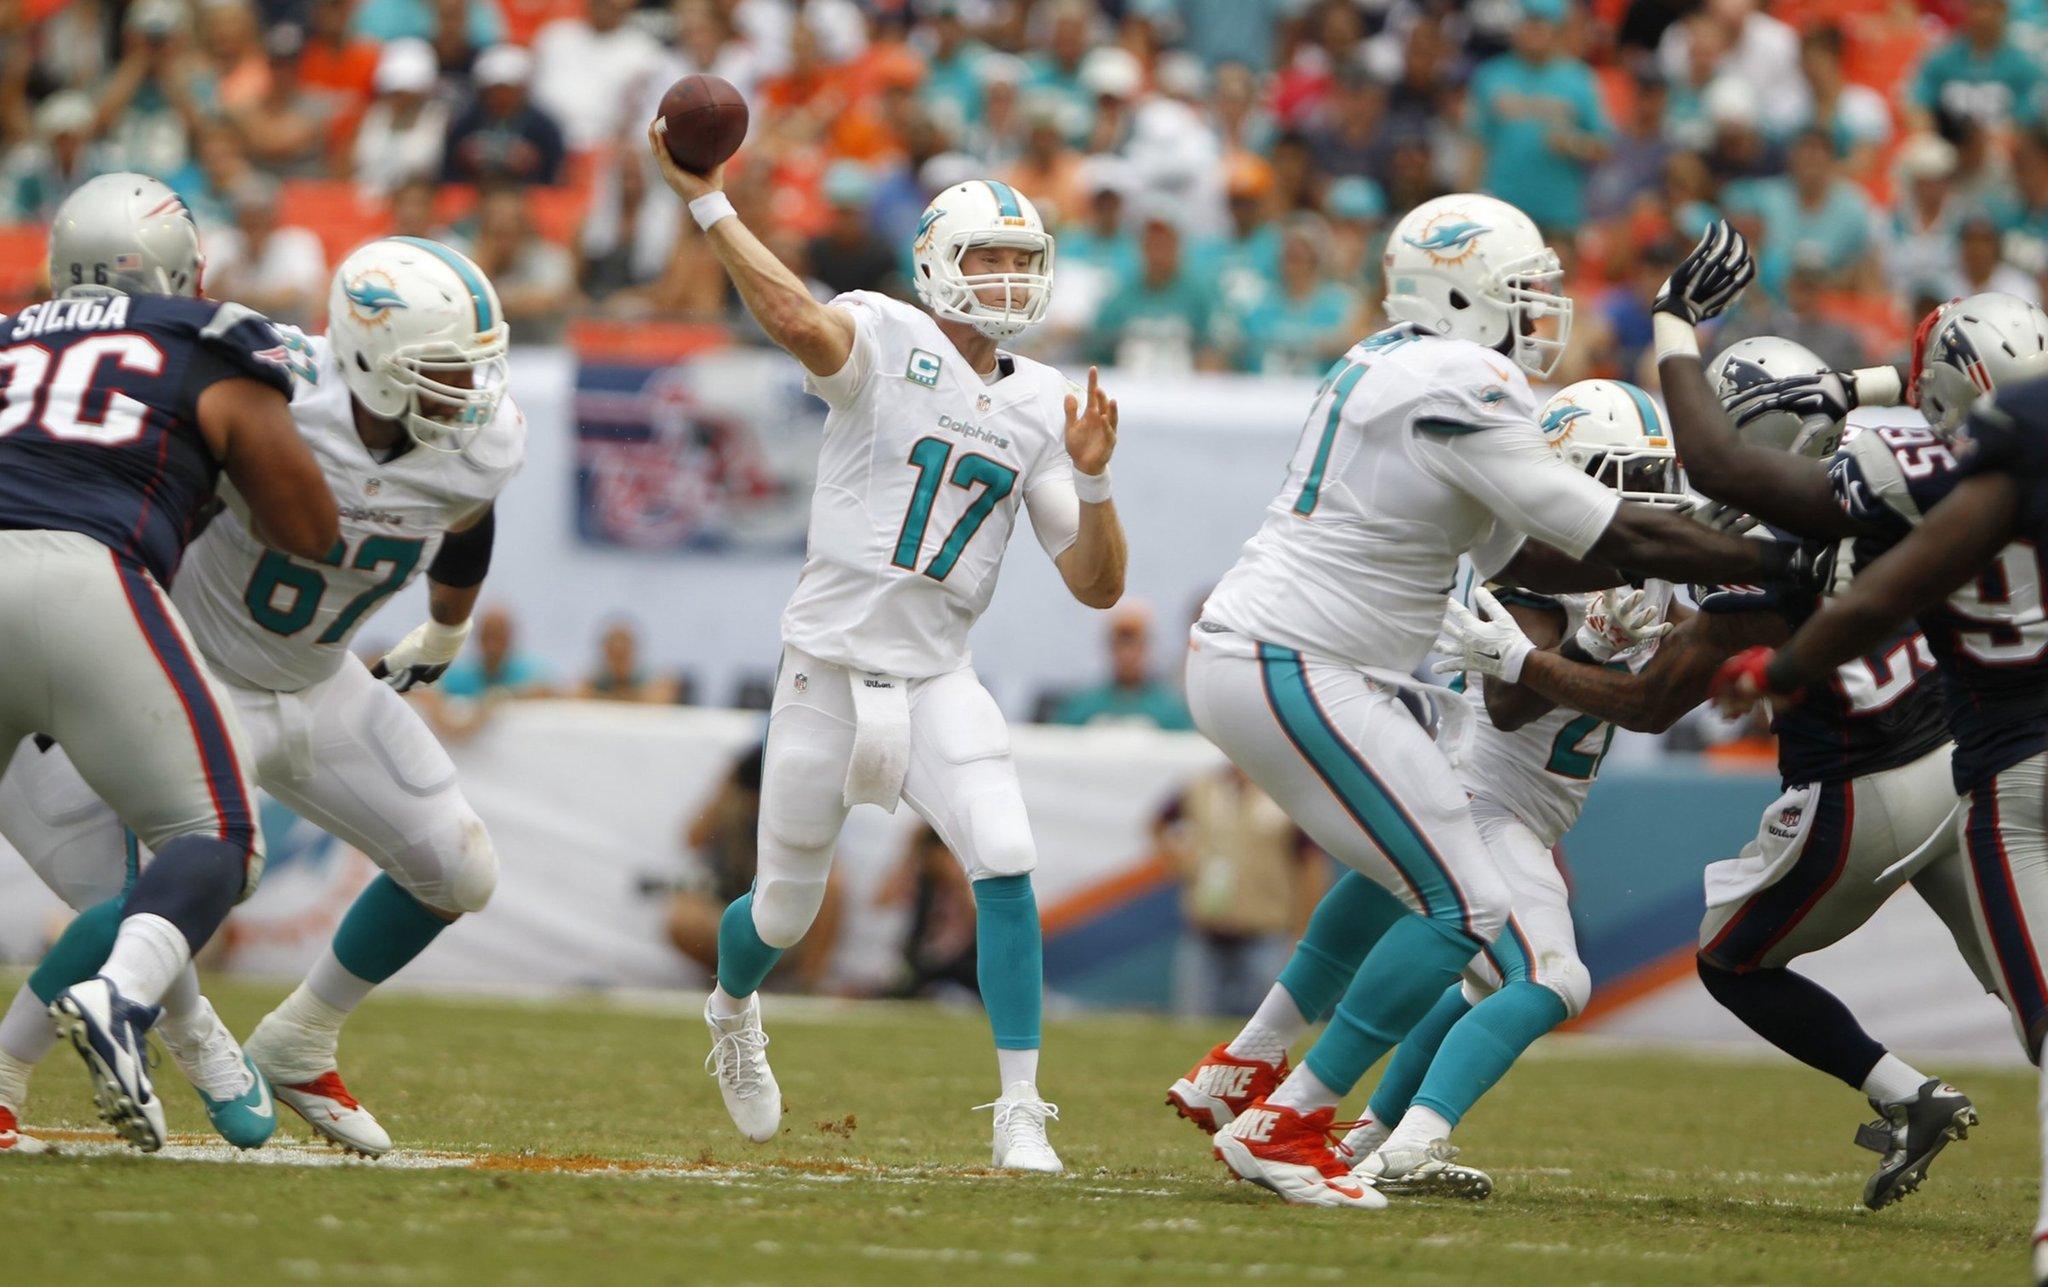 2017 Miami Dolphins schedule - Capital Gazette